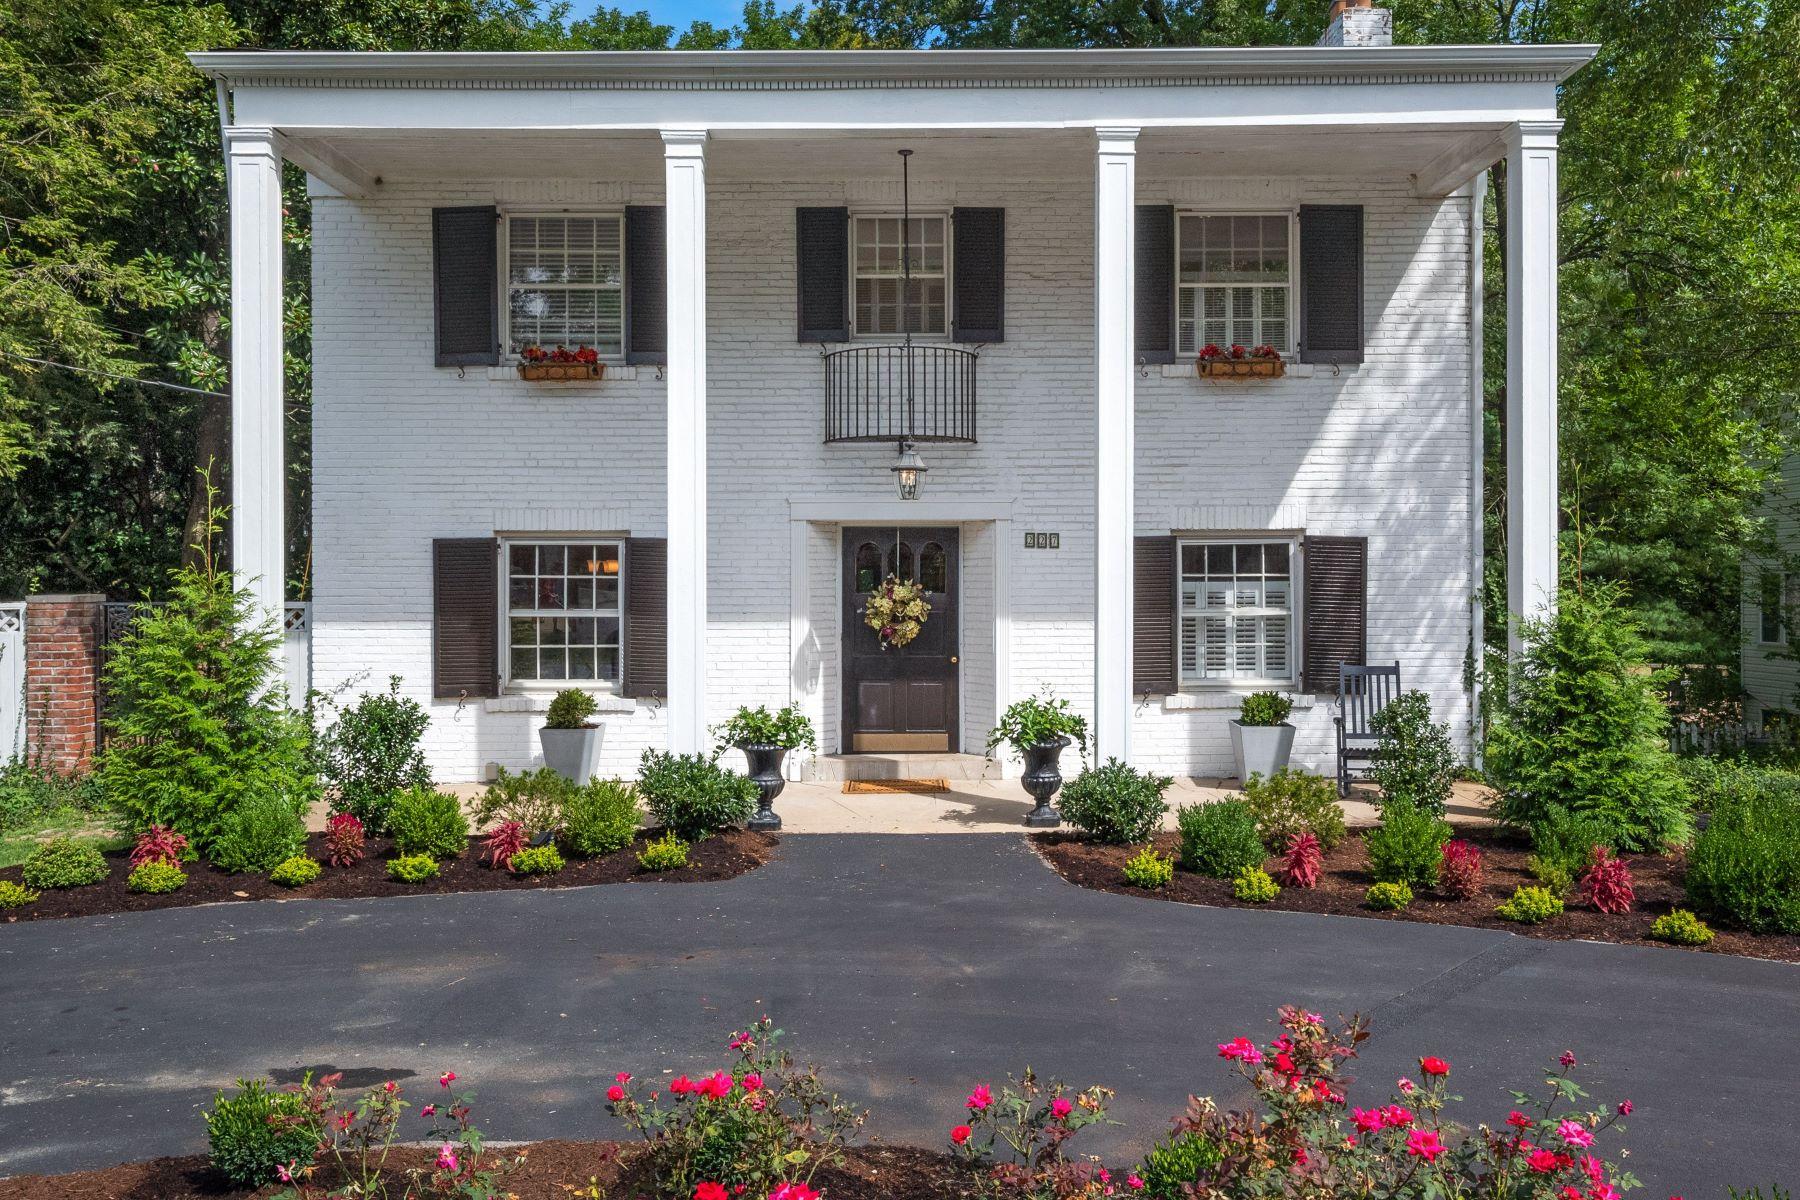 Single Family Homes for Sale at Quintessential Kirkwood Home 227 Orrick Lane Kirkwood, Missouri 63122 United States